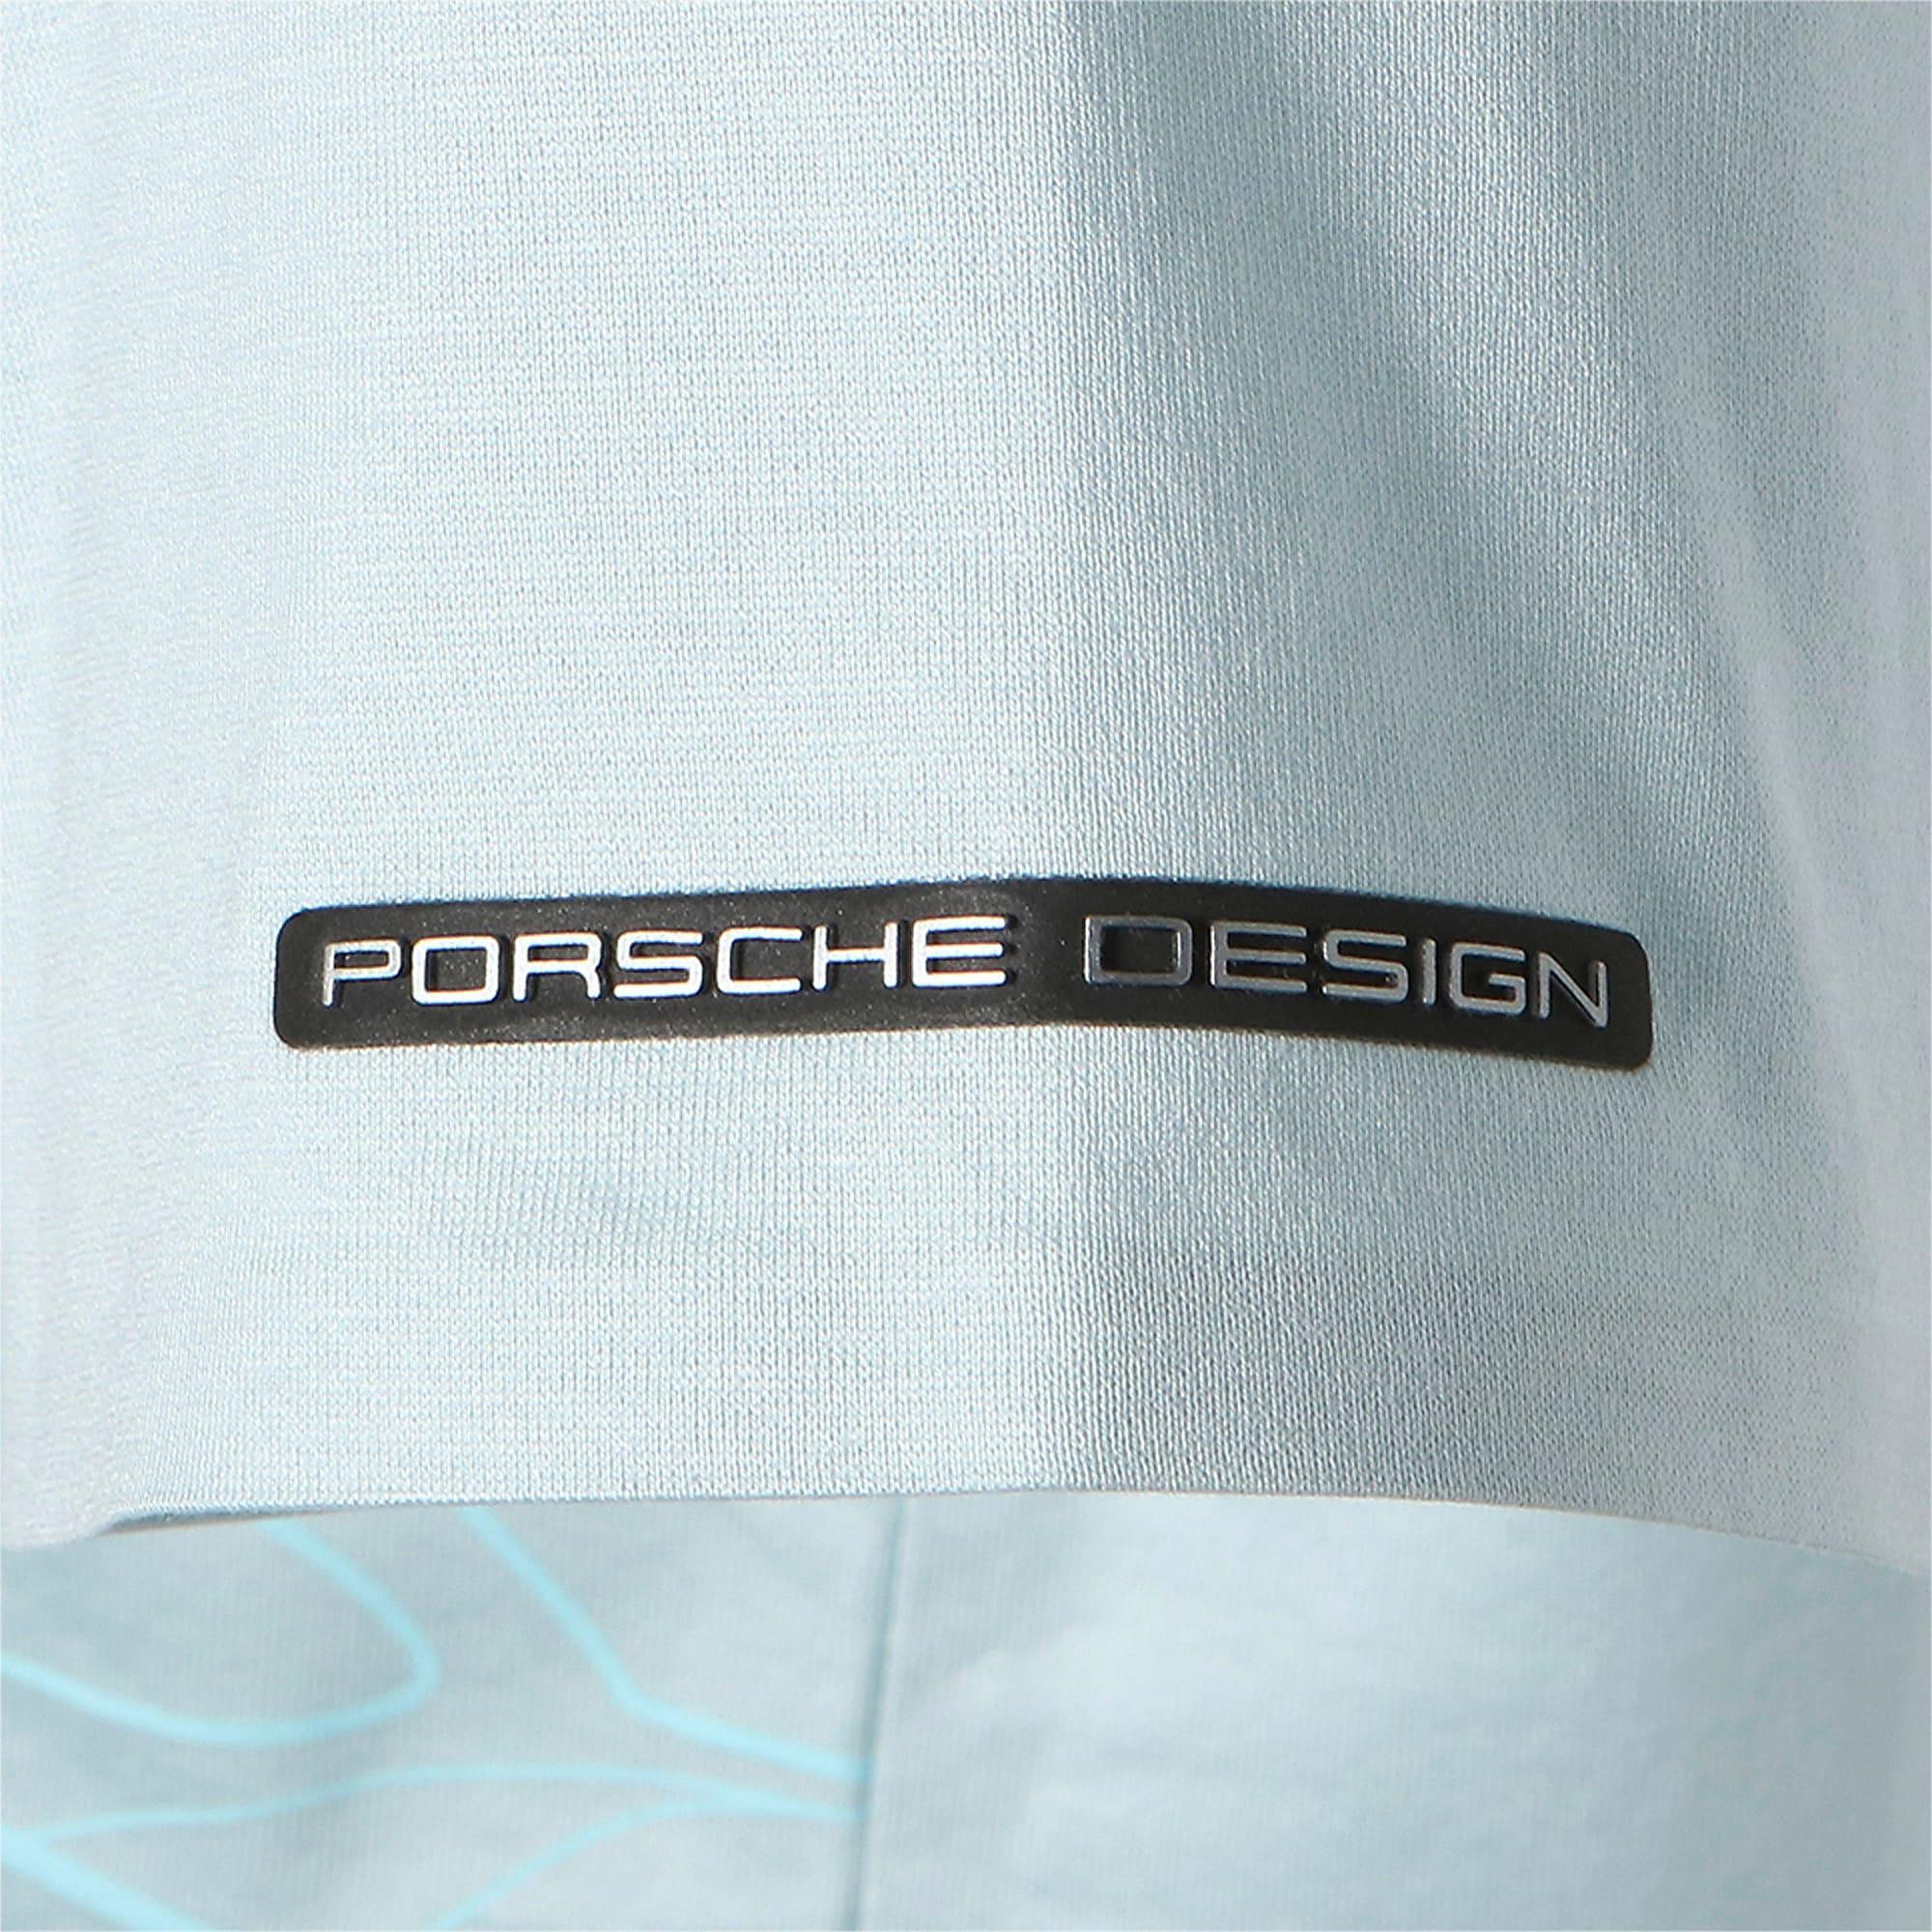 Thumbnail 8 of PORSCHE DESIGN  グラフィック Tシャツ, Light Sky, medium-JPN